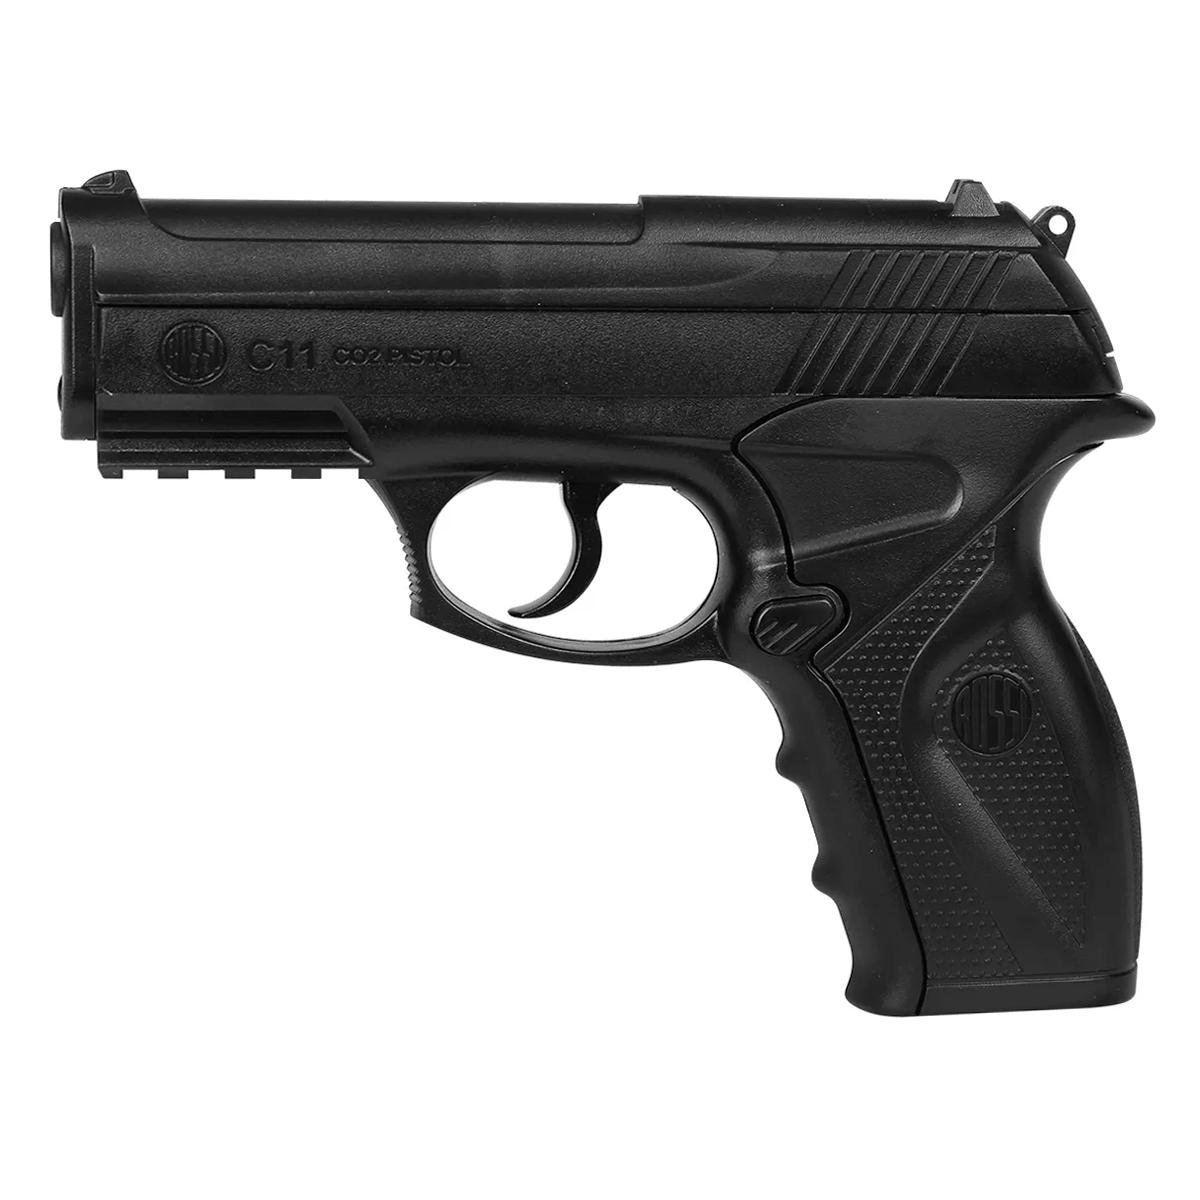 Pistola de Pressão Wingun C11 Rossi 4,5mm CO2 428 FPS